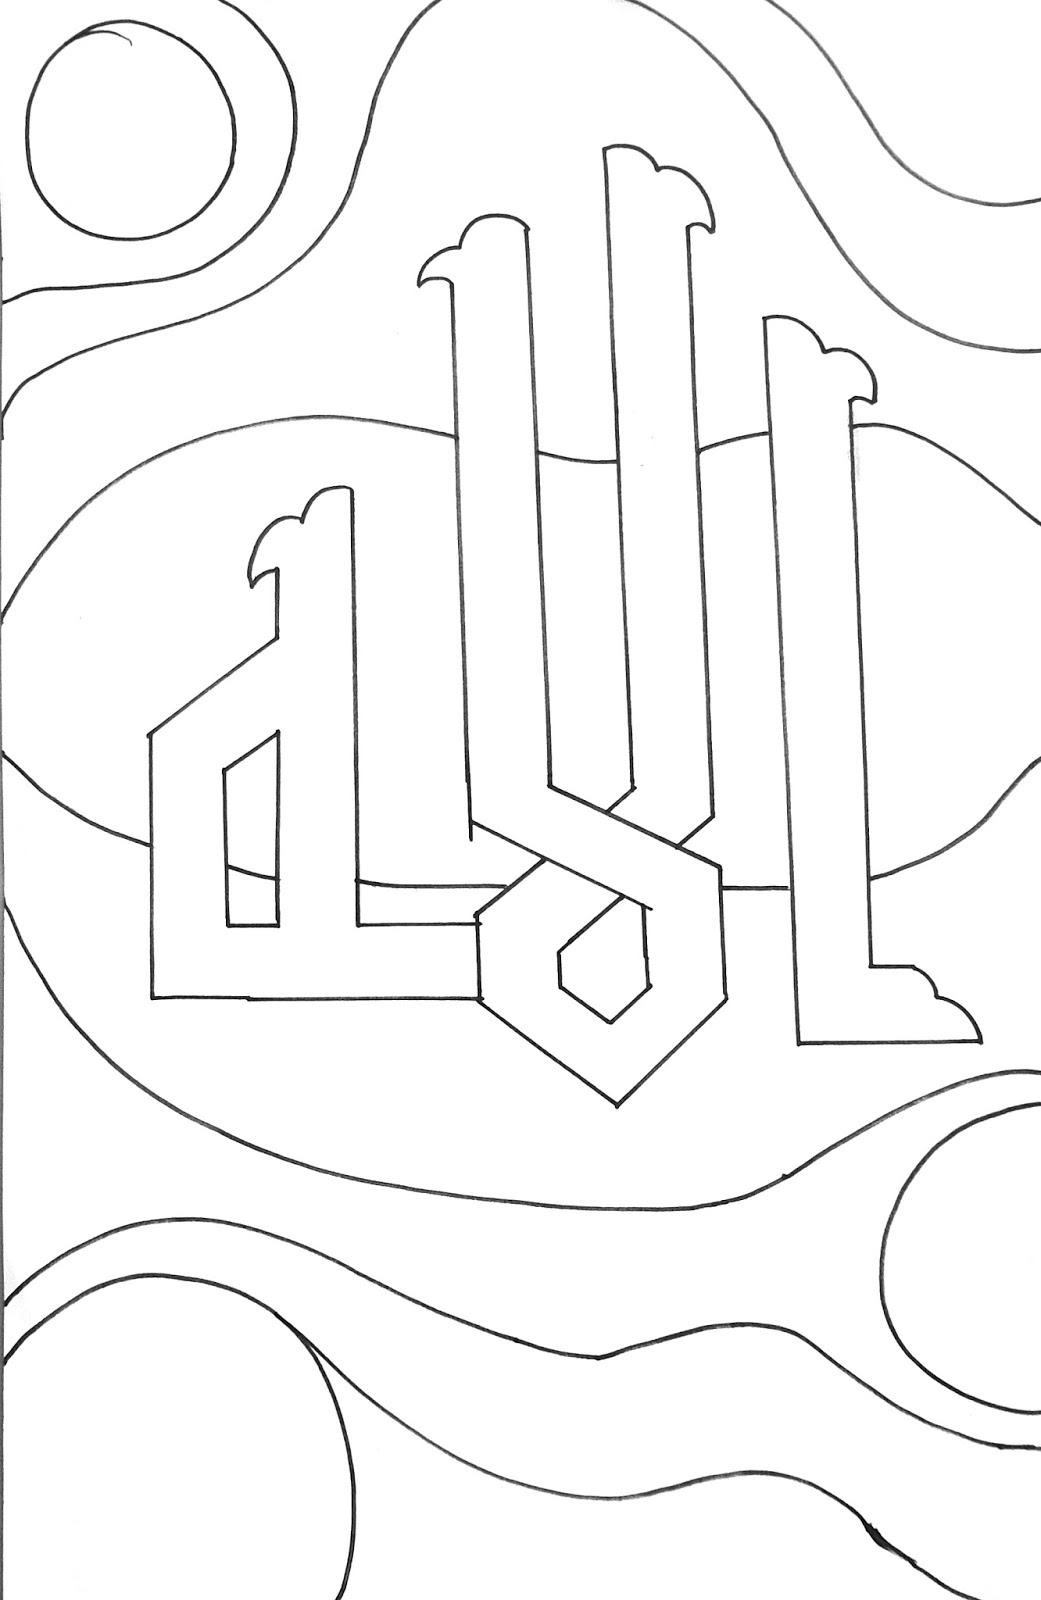 Cara Mewarnai Kaligrafi 2 Kantatailmu